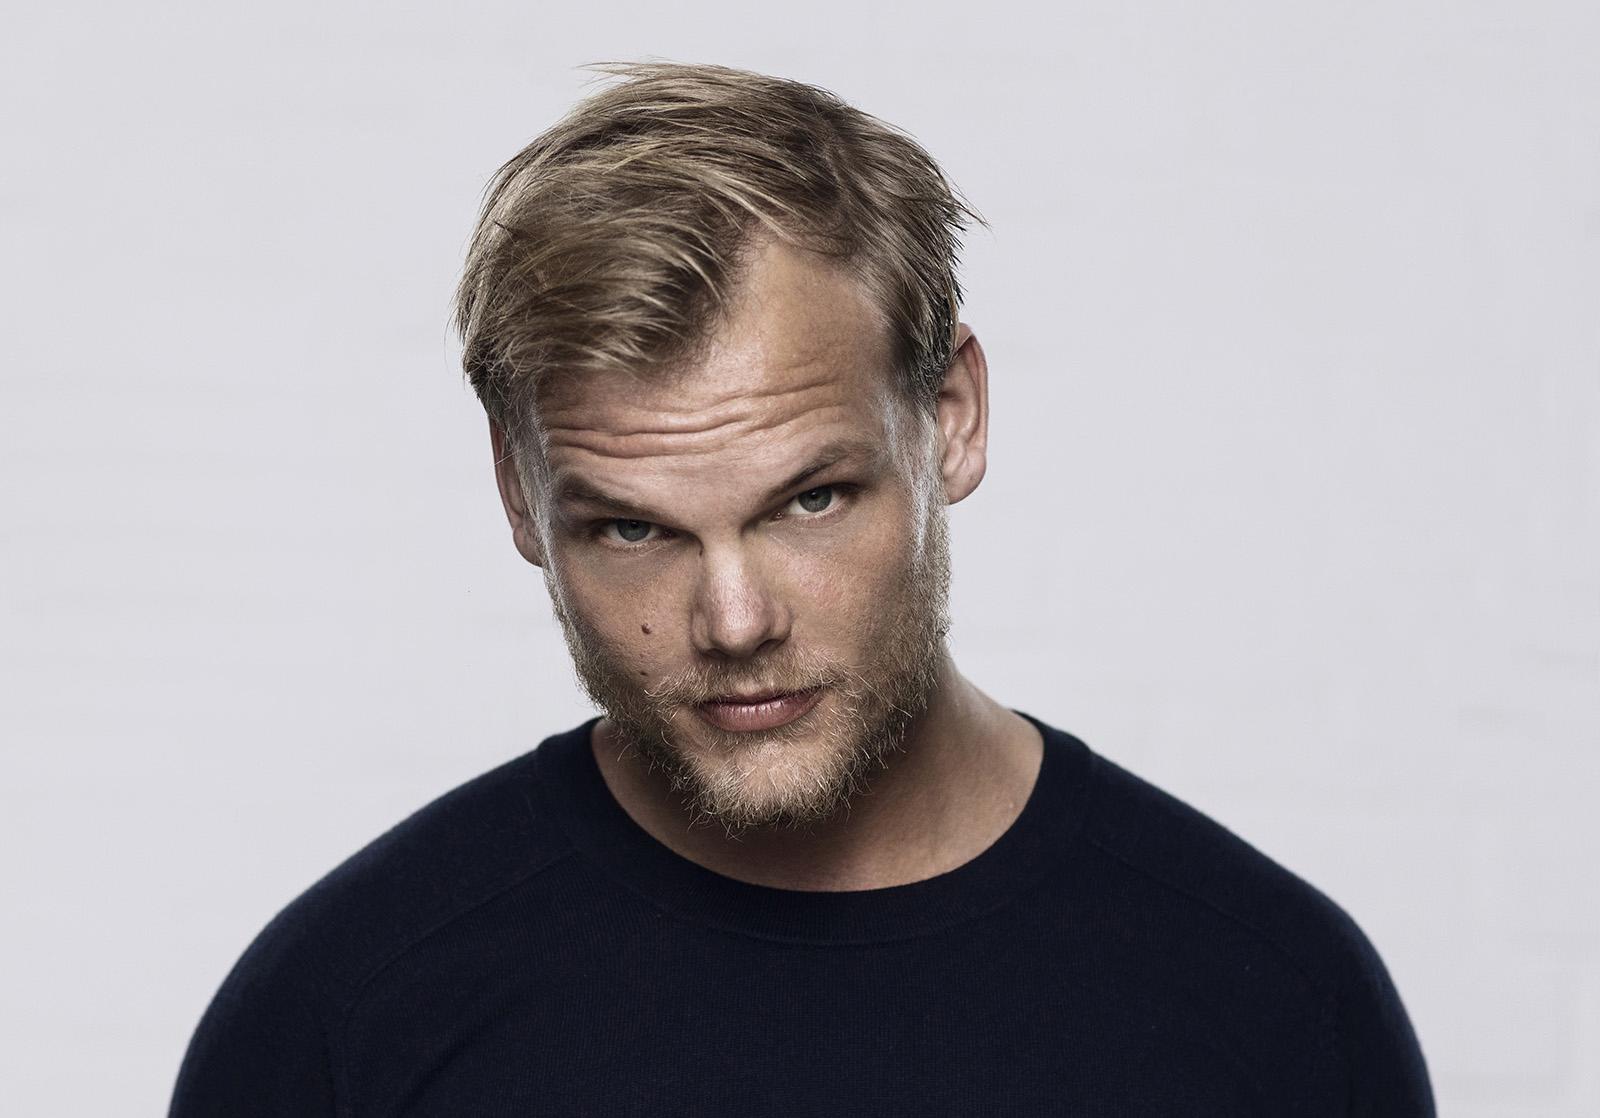 Muere el DJ sueco Avicci